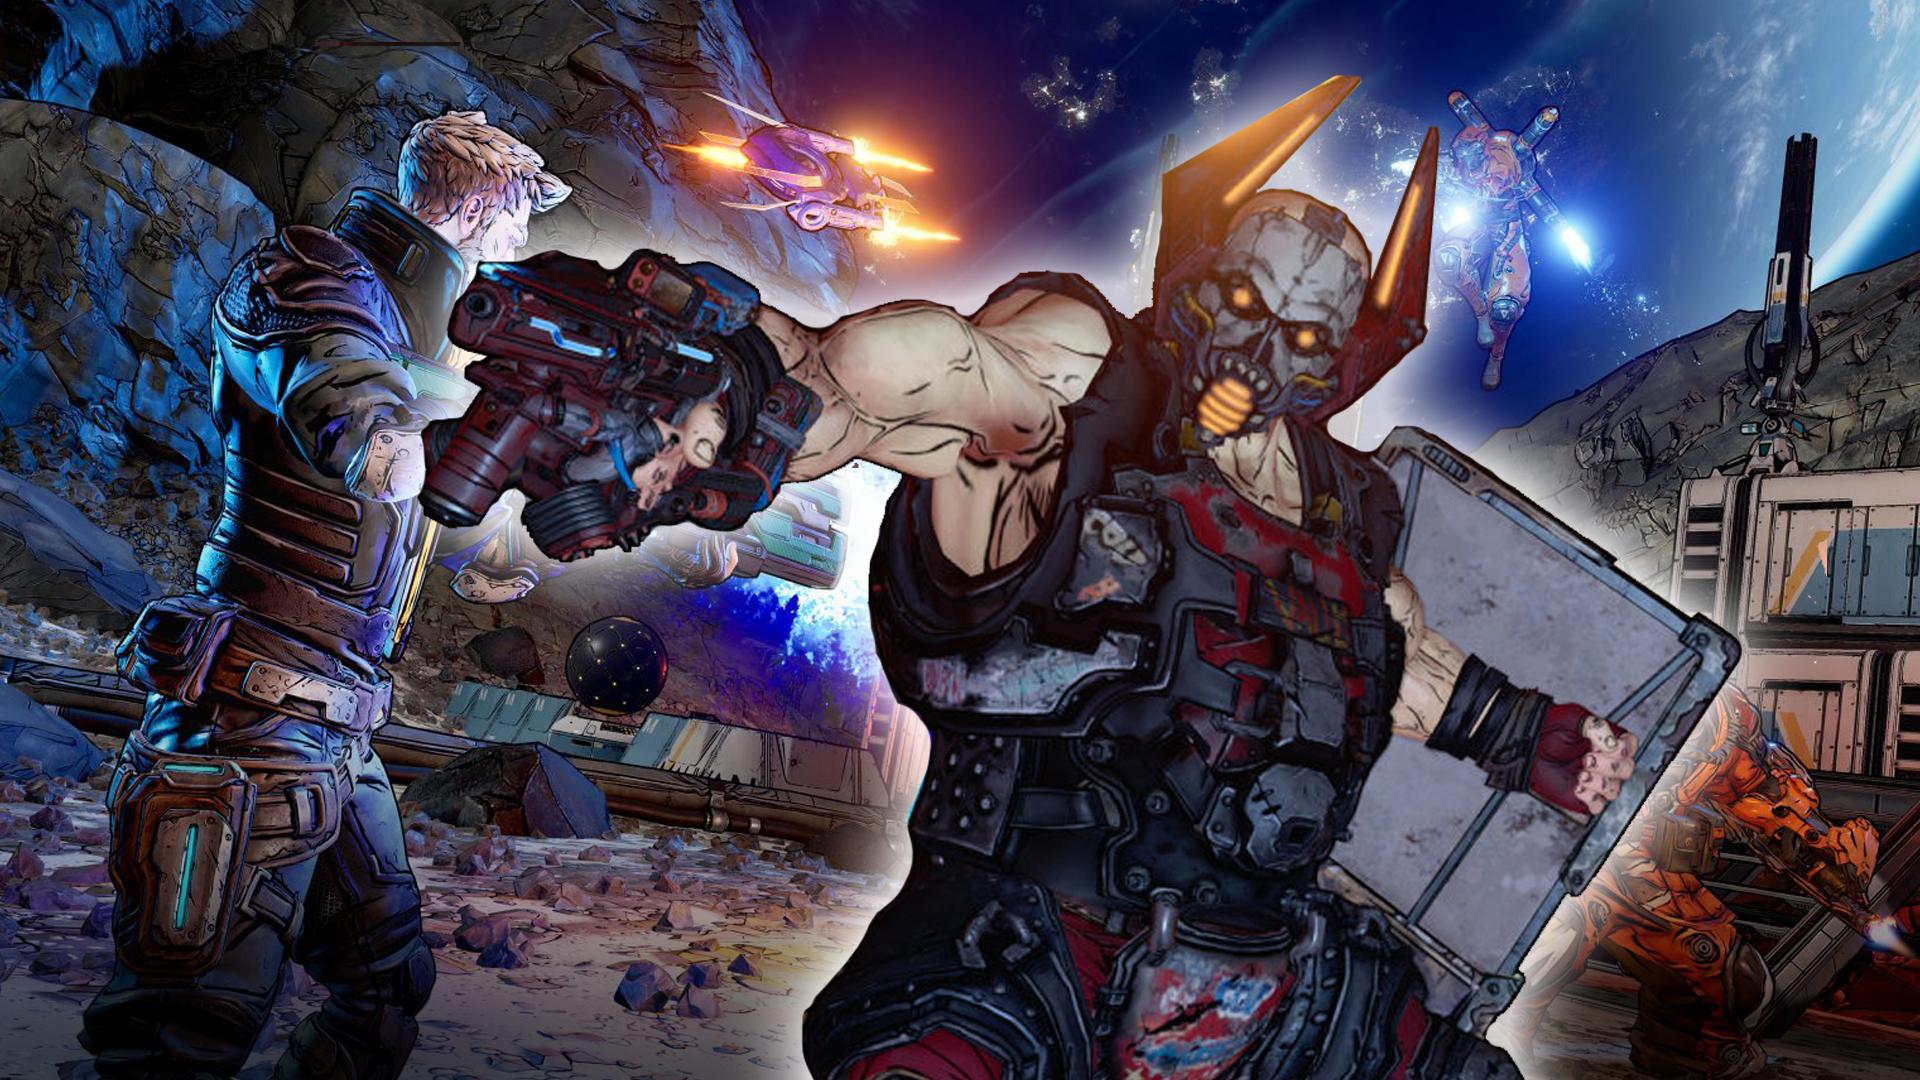 Borderlands 3 guide: How to unlock class mods